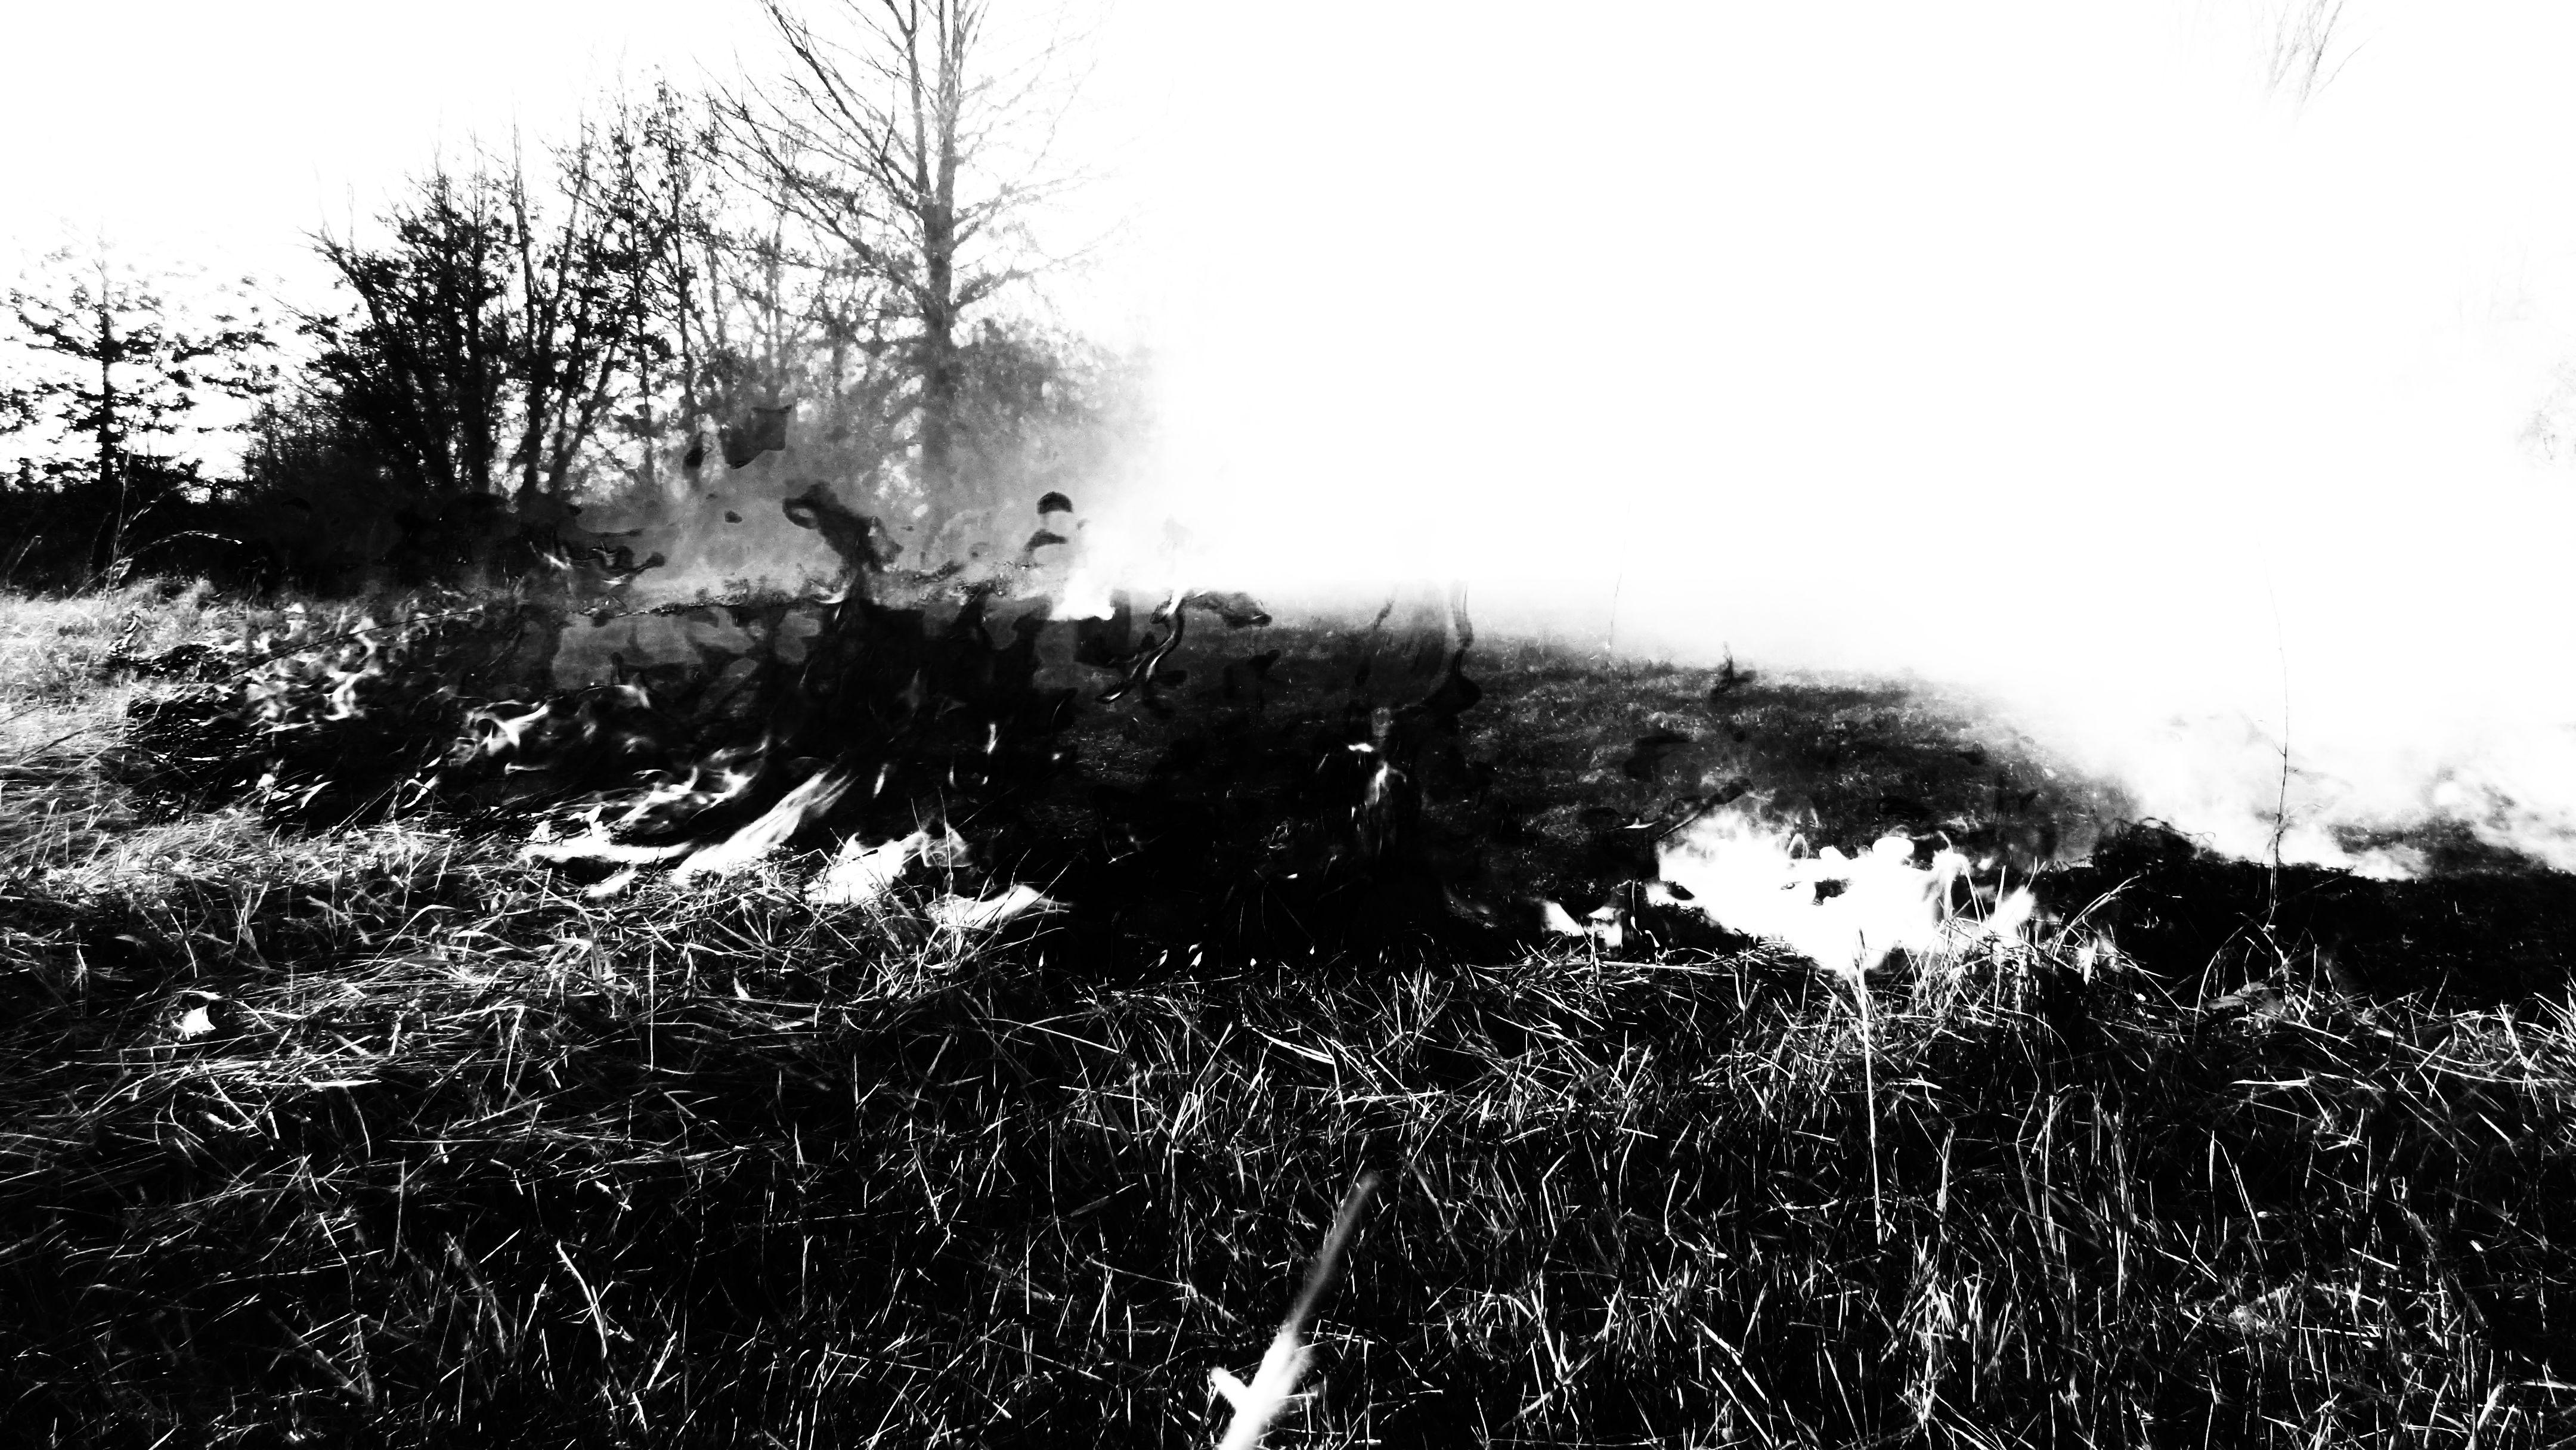 blackfire by errortonin